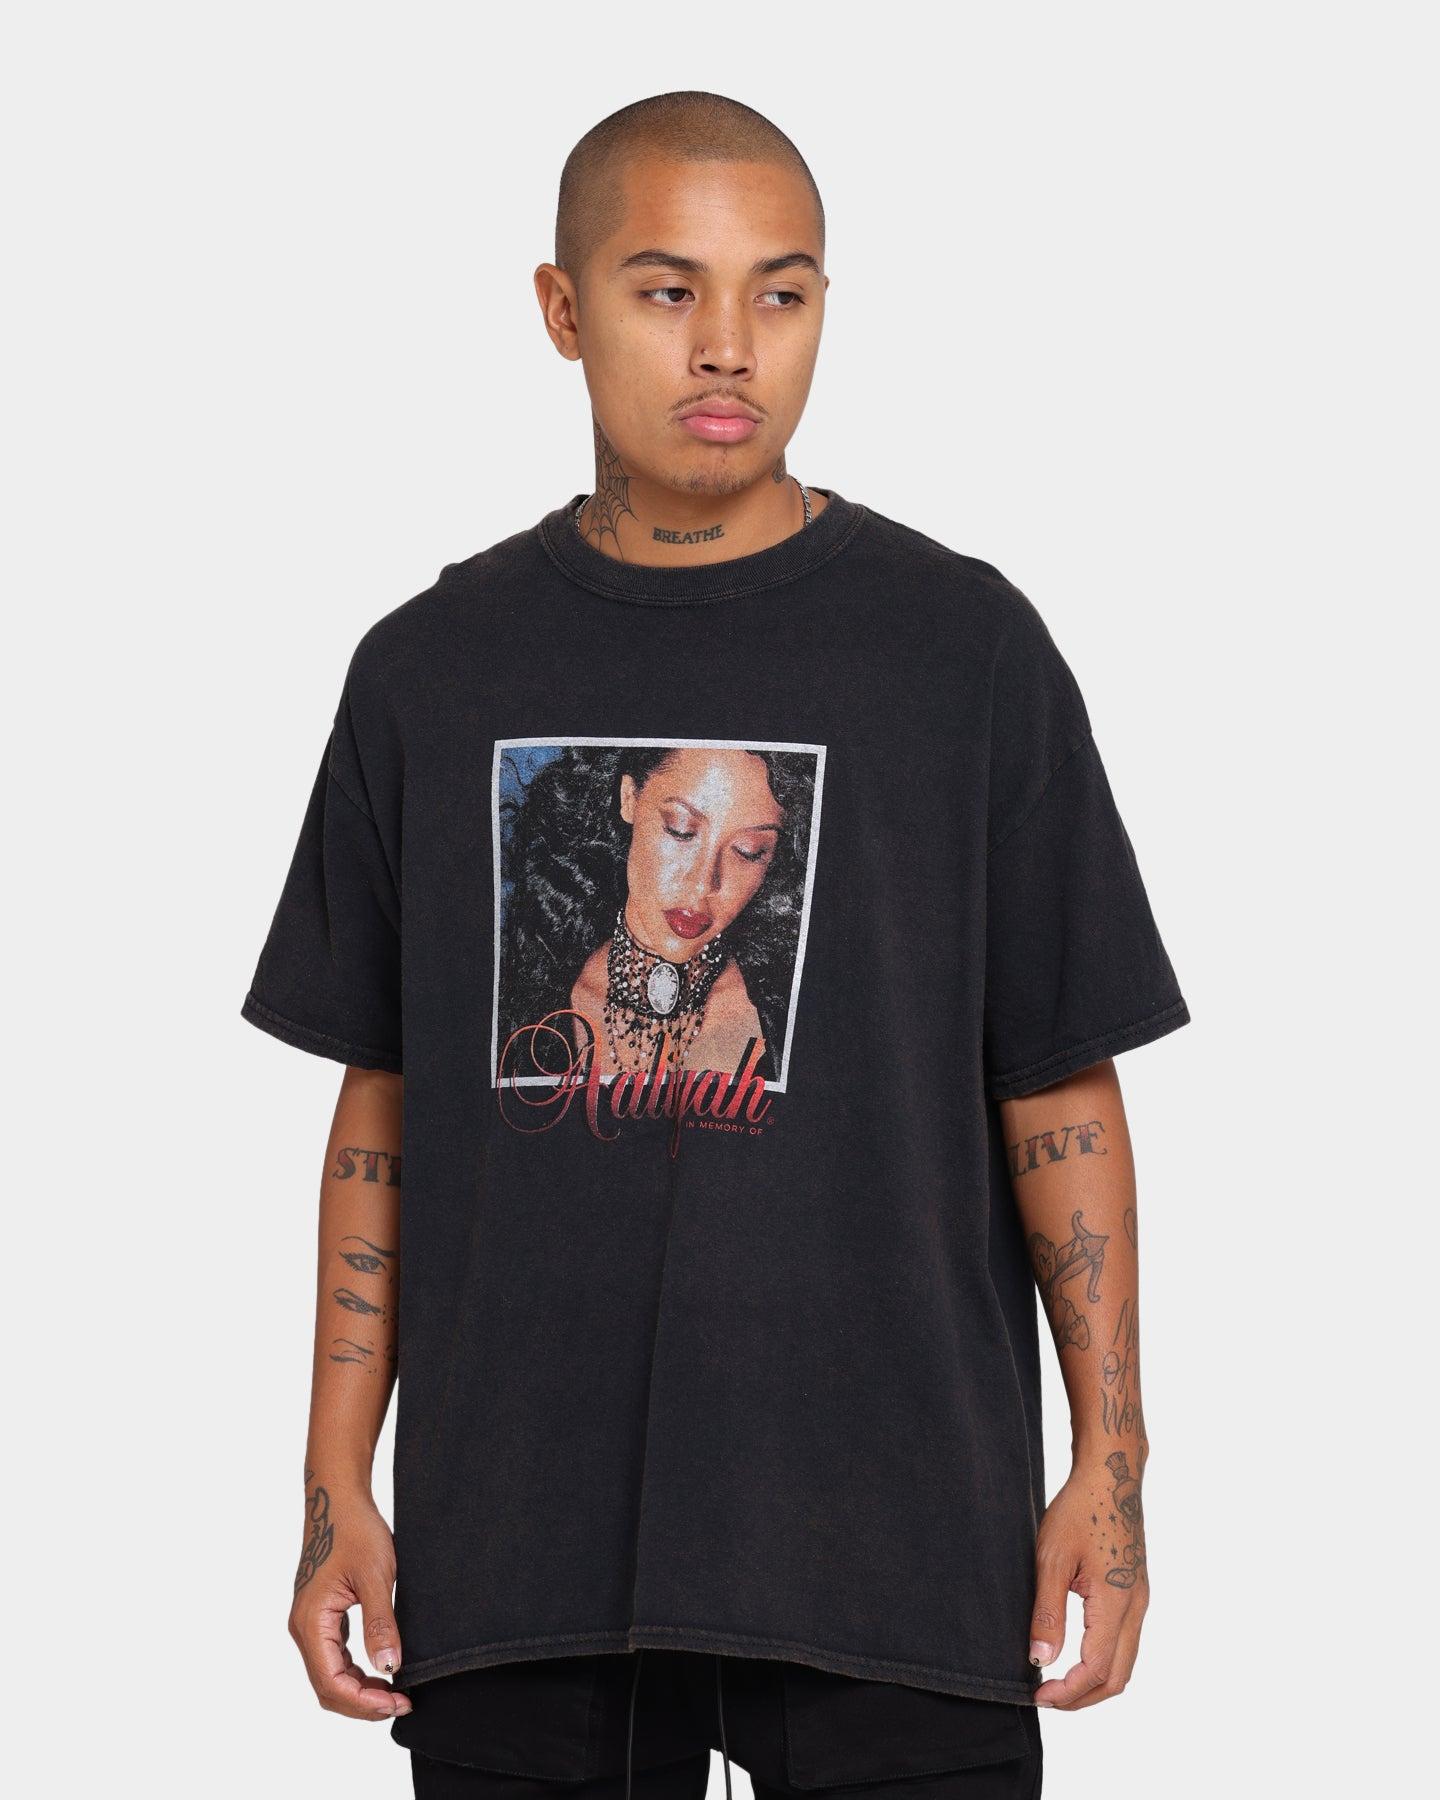 Rock Off Aaliyah T Shirt Trippy Logo Nouveau Officiel Homme